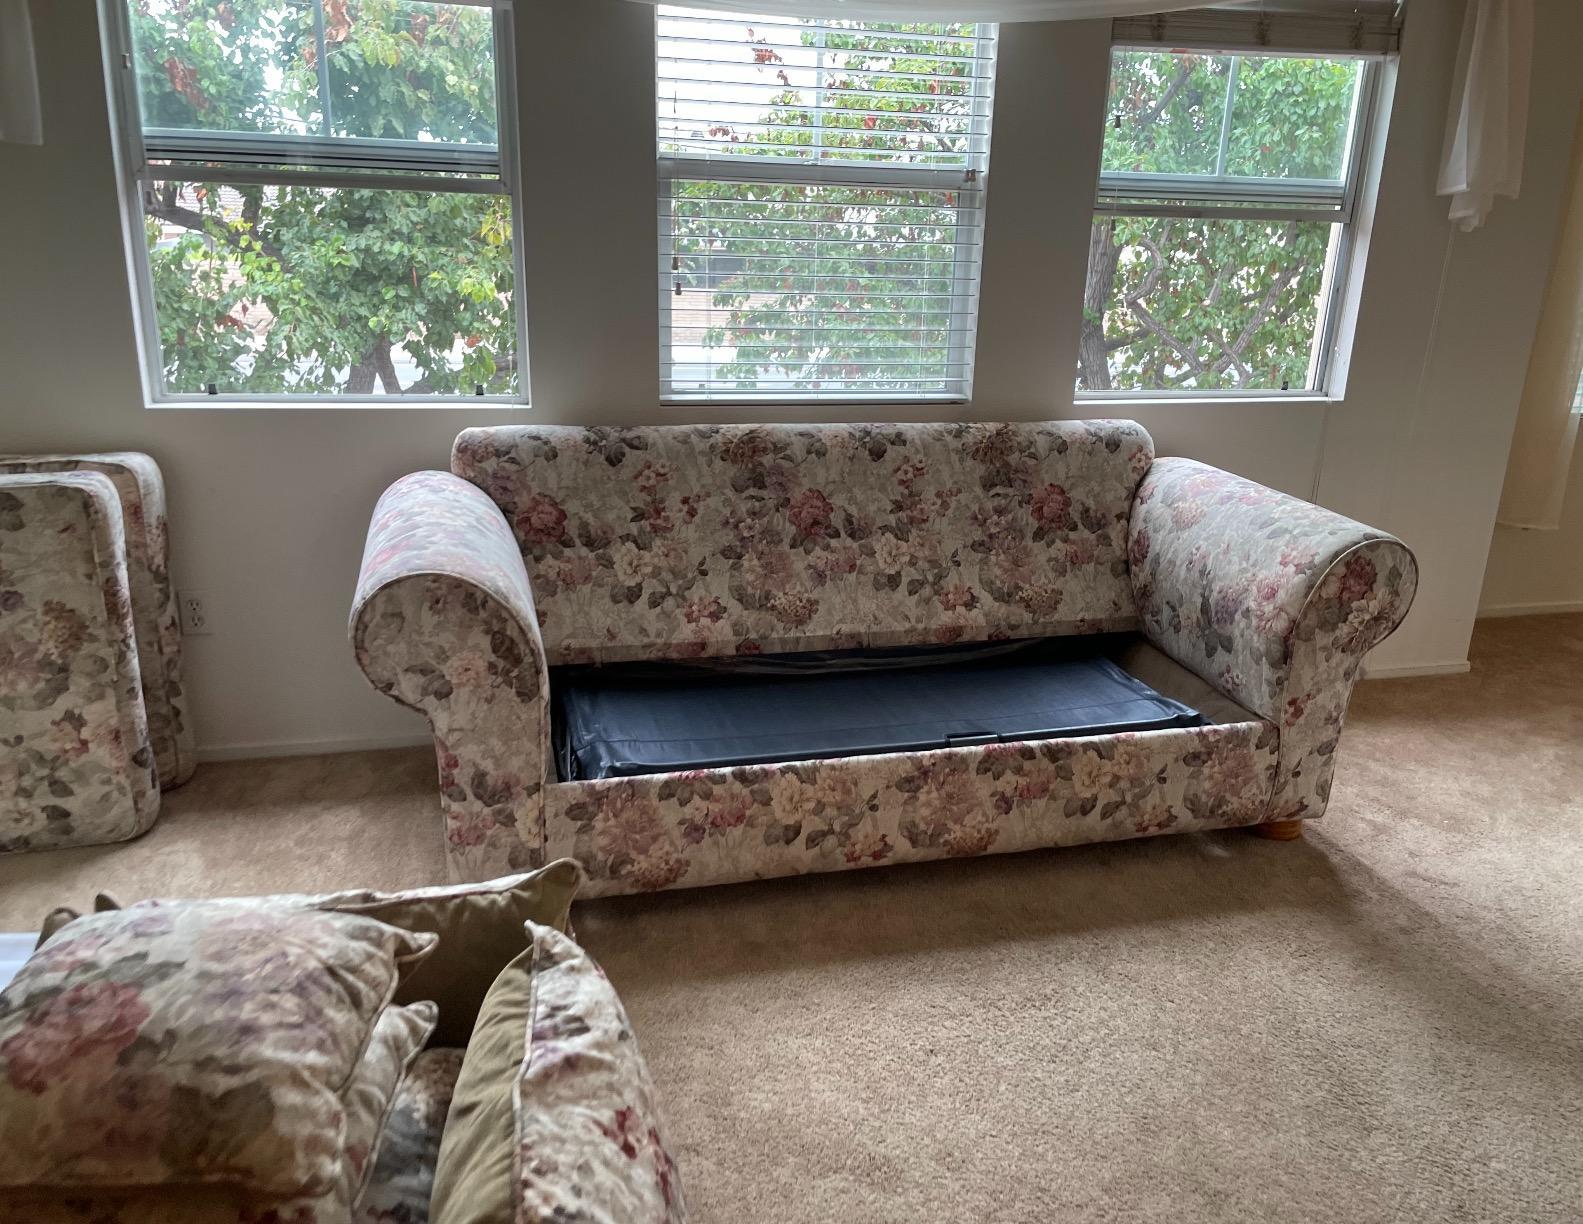 Furniture Removal Services in Cerritos, CA. - Before Photo